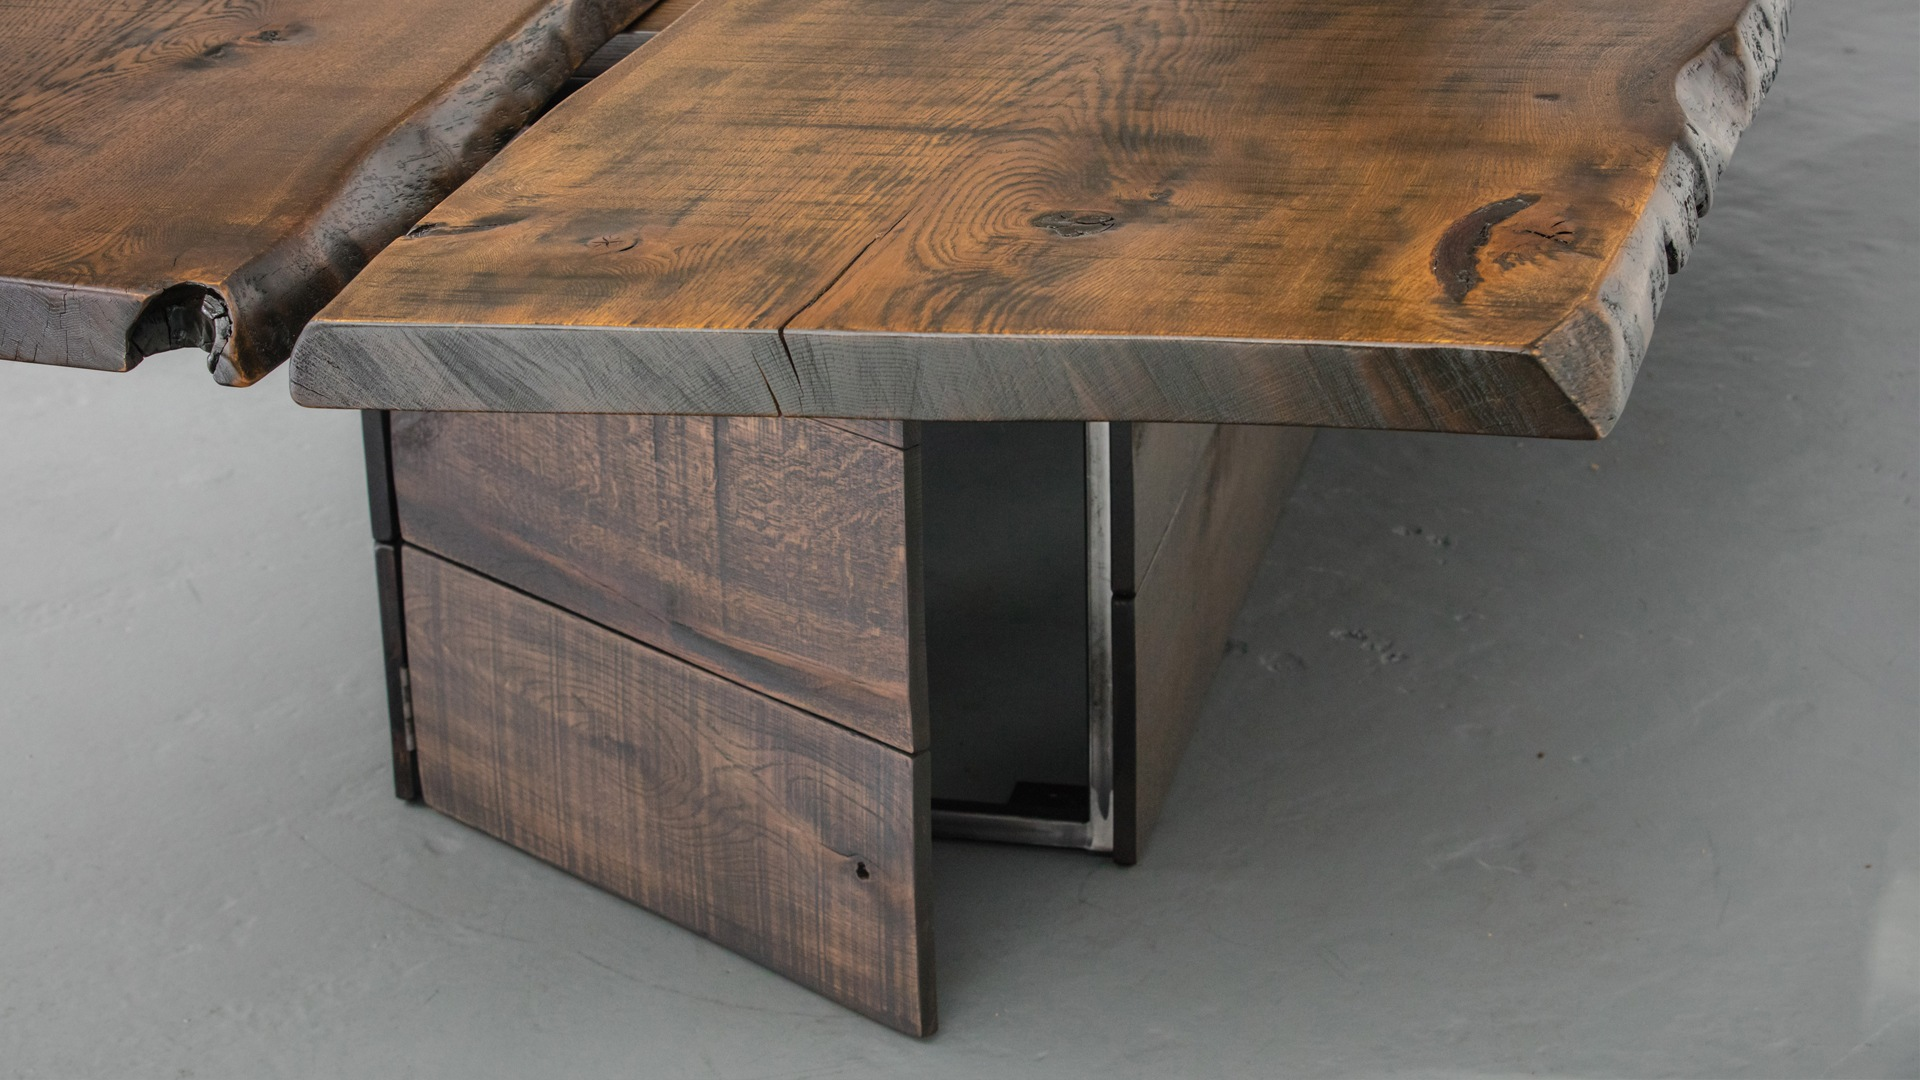 oak table sv-grand-oak-table-003 HUHFRXY